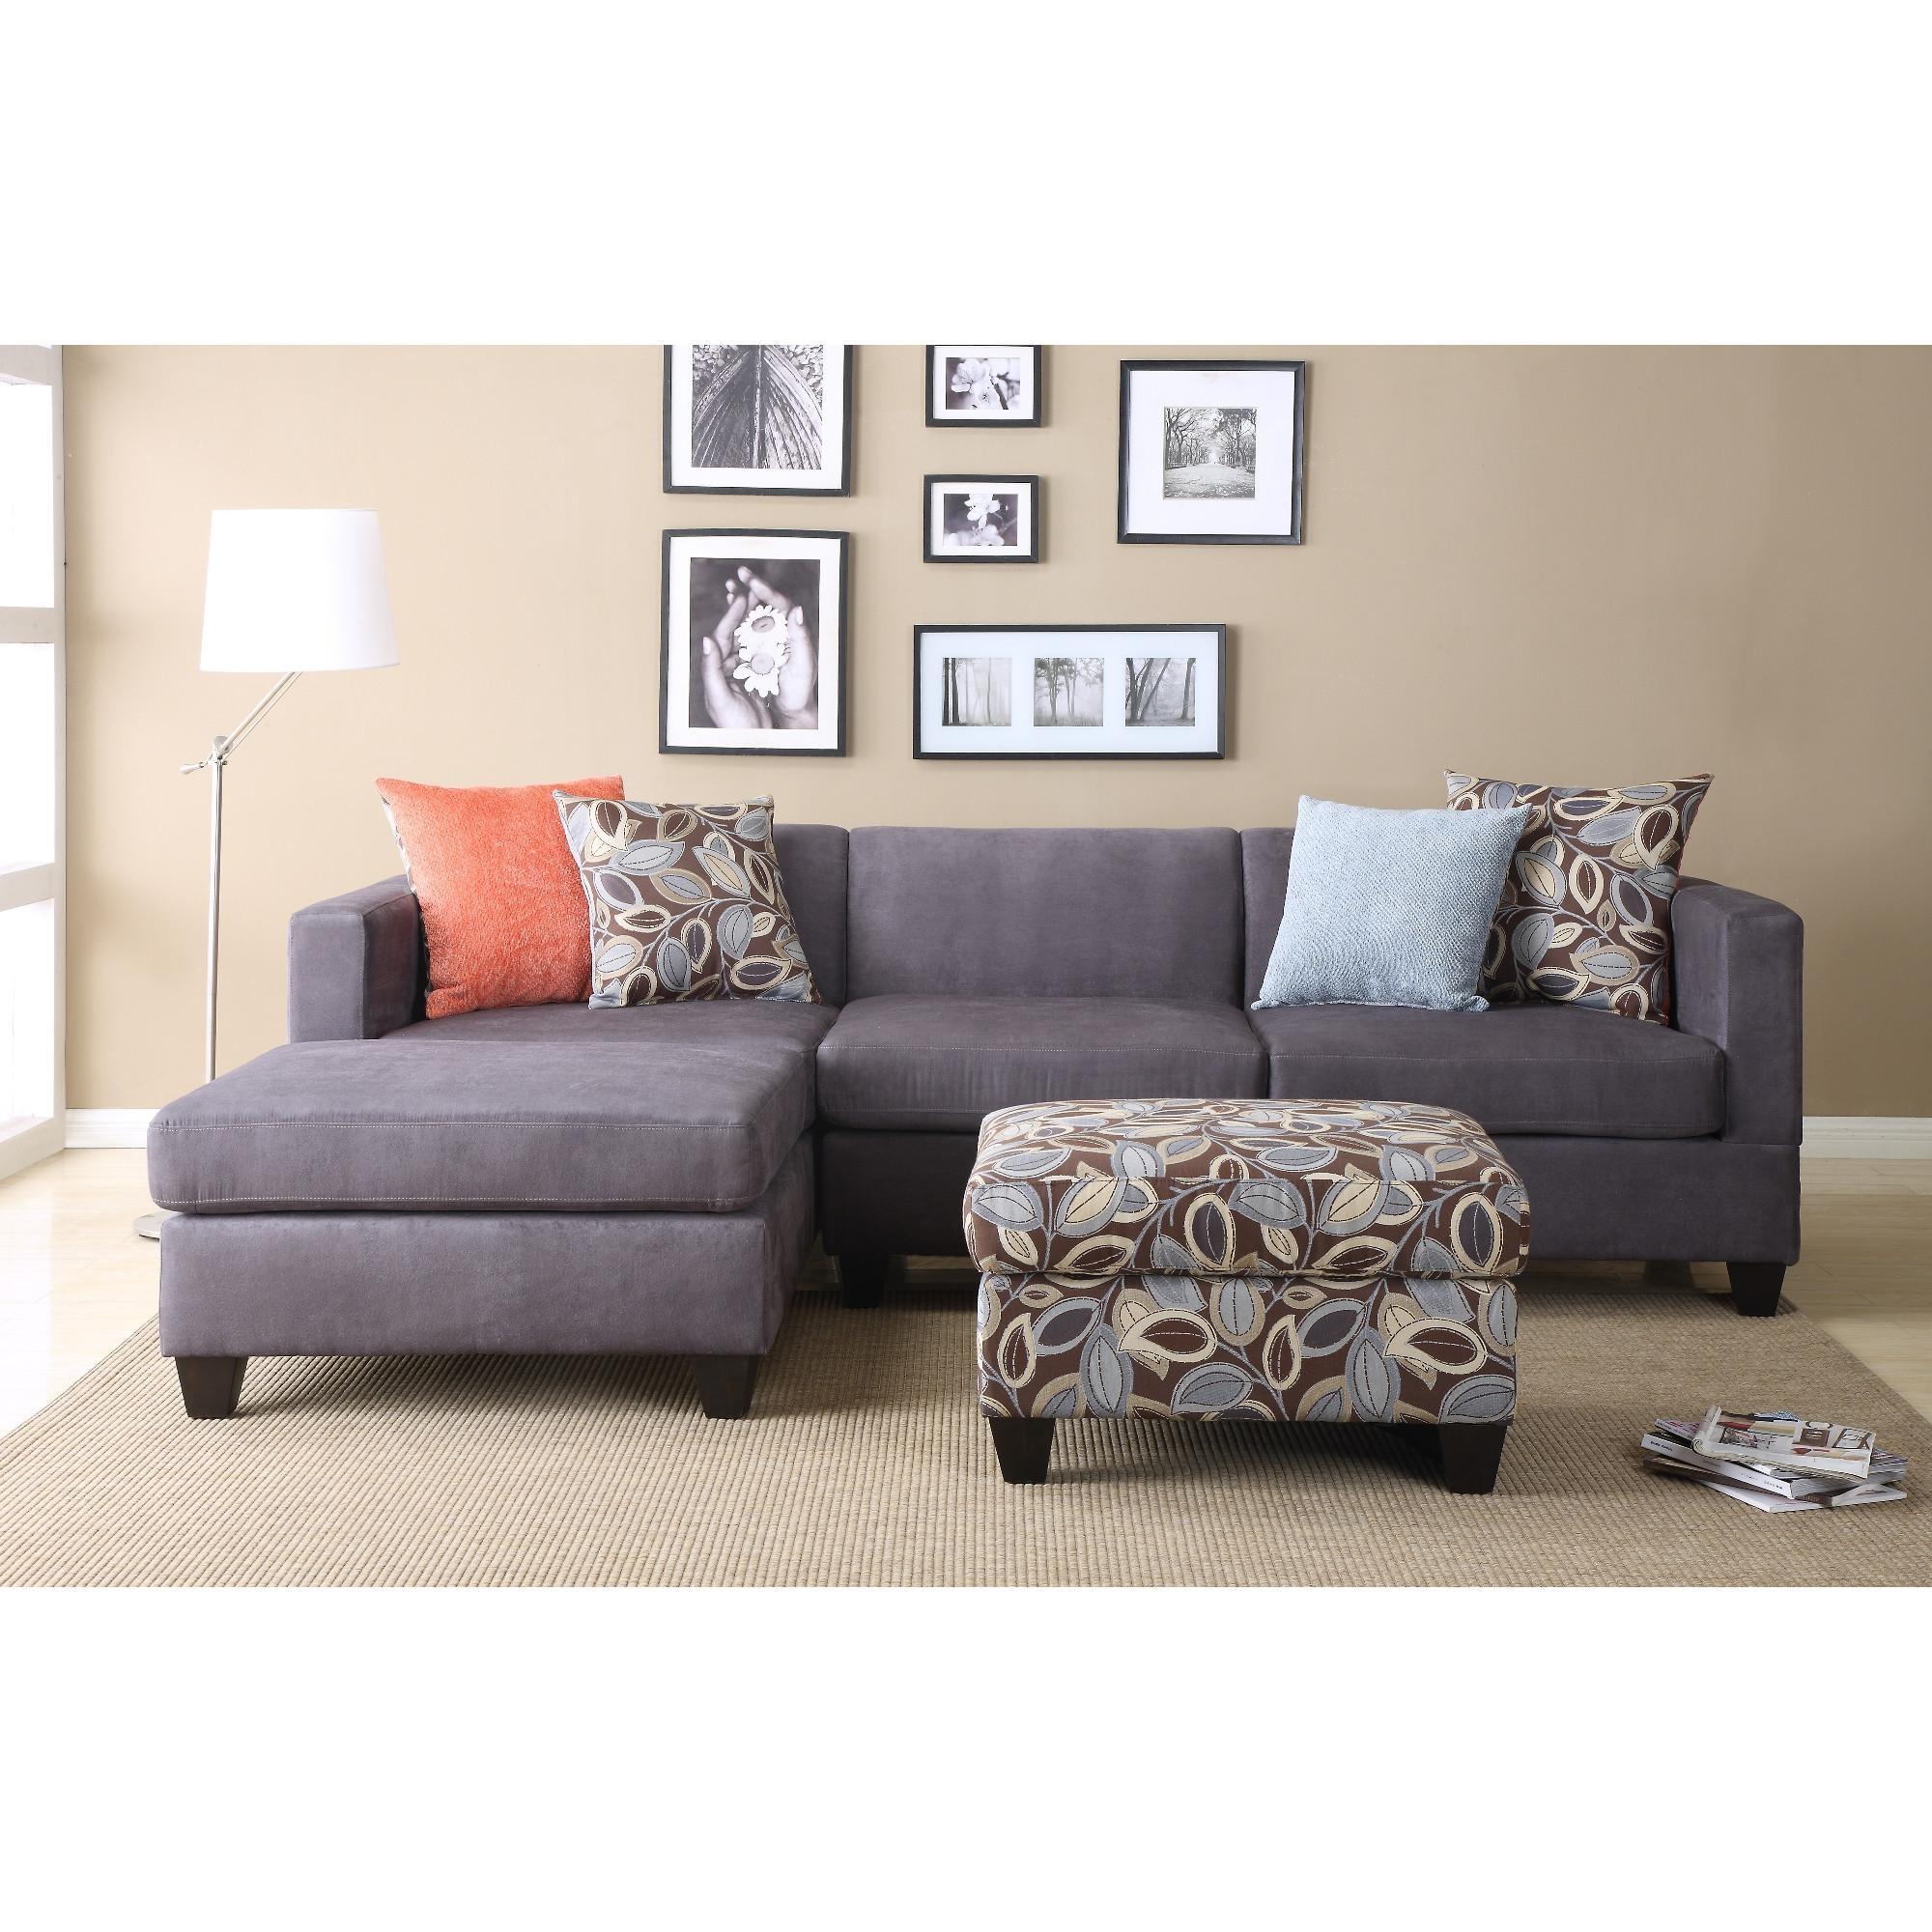 20 Choices Of Cindy Crawford Sofas Sofa Ideas